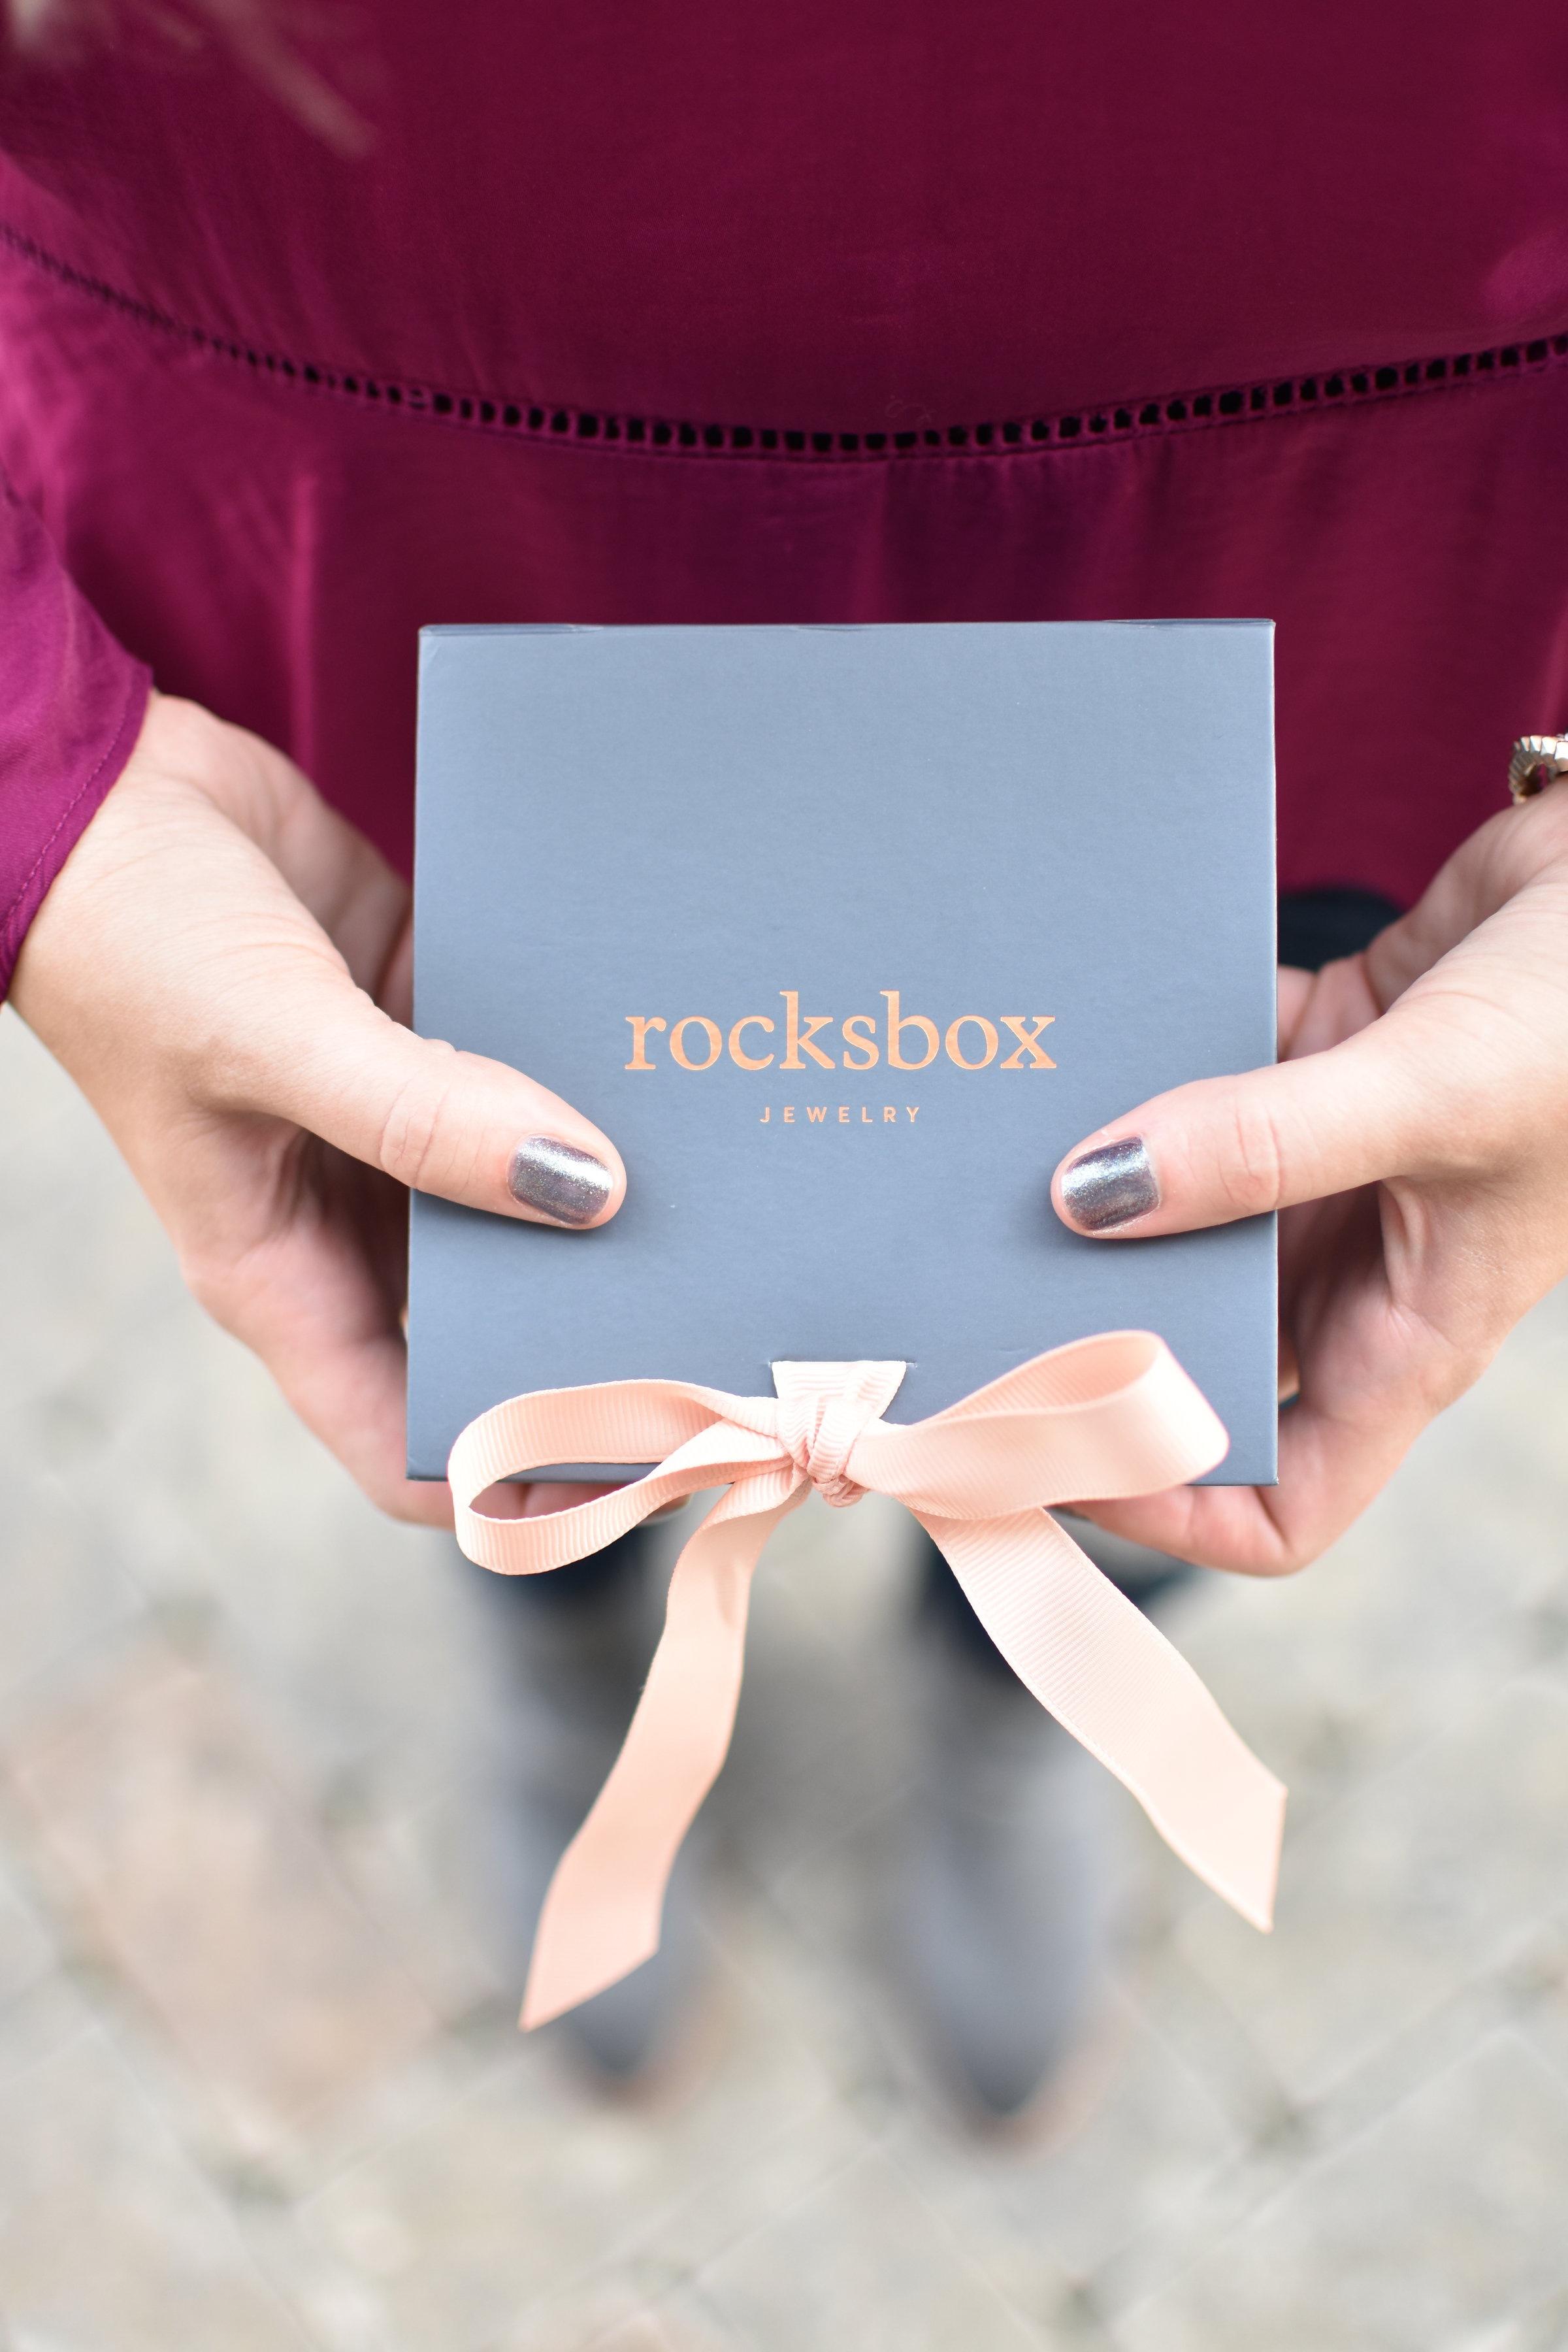 rocksbox 553.jpg